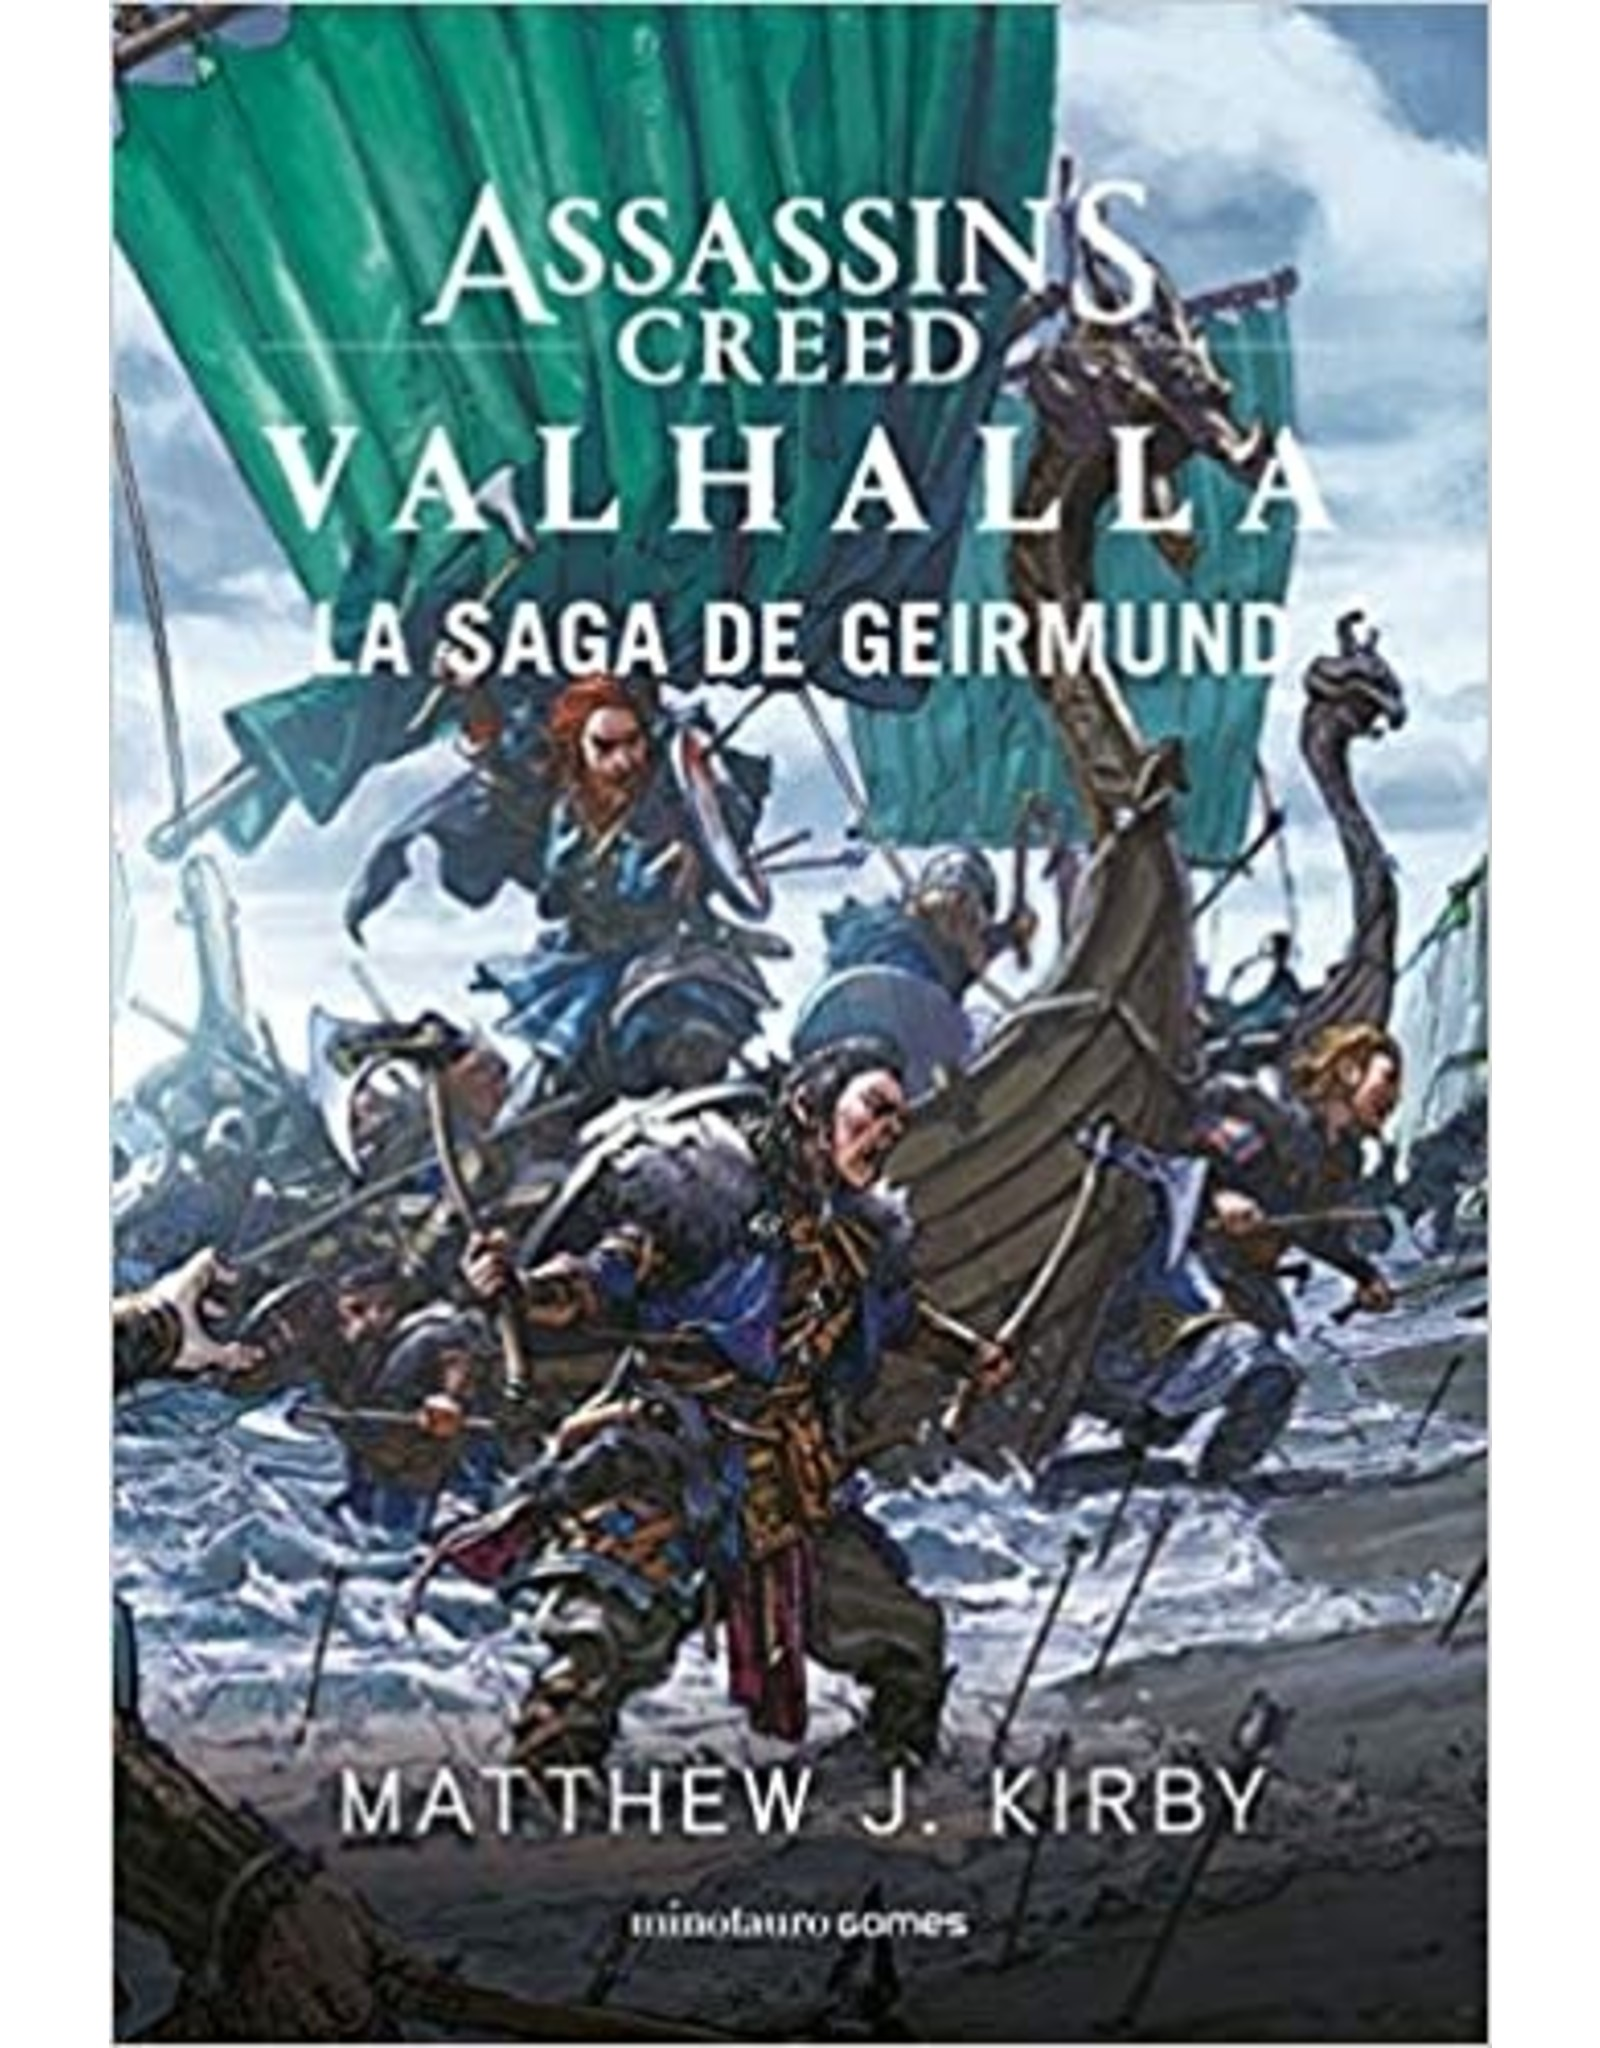 Asmodee Assassin's Creed Valhalla: Geirmund's Saga (novel)